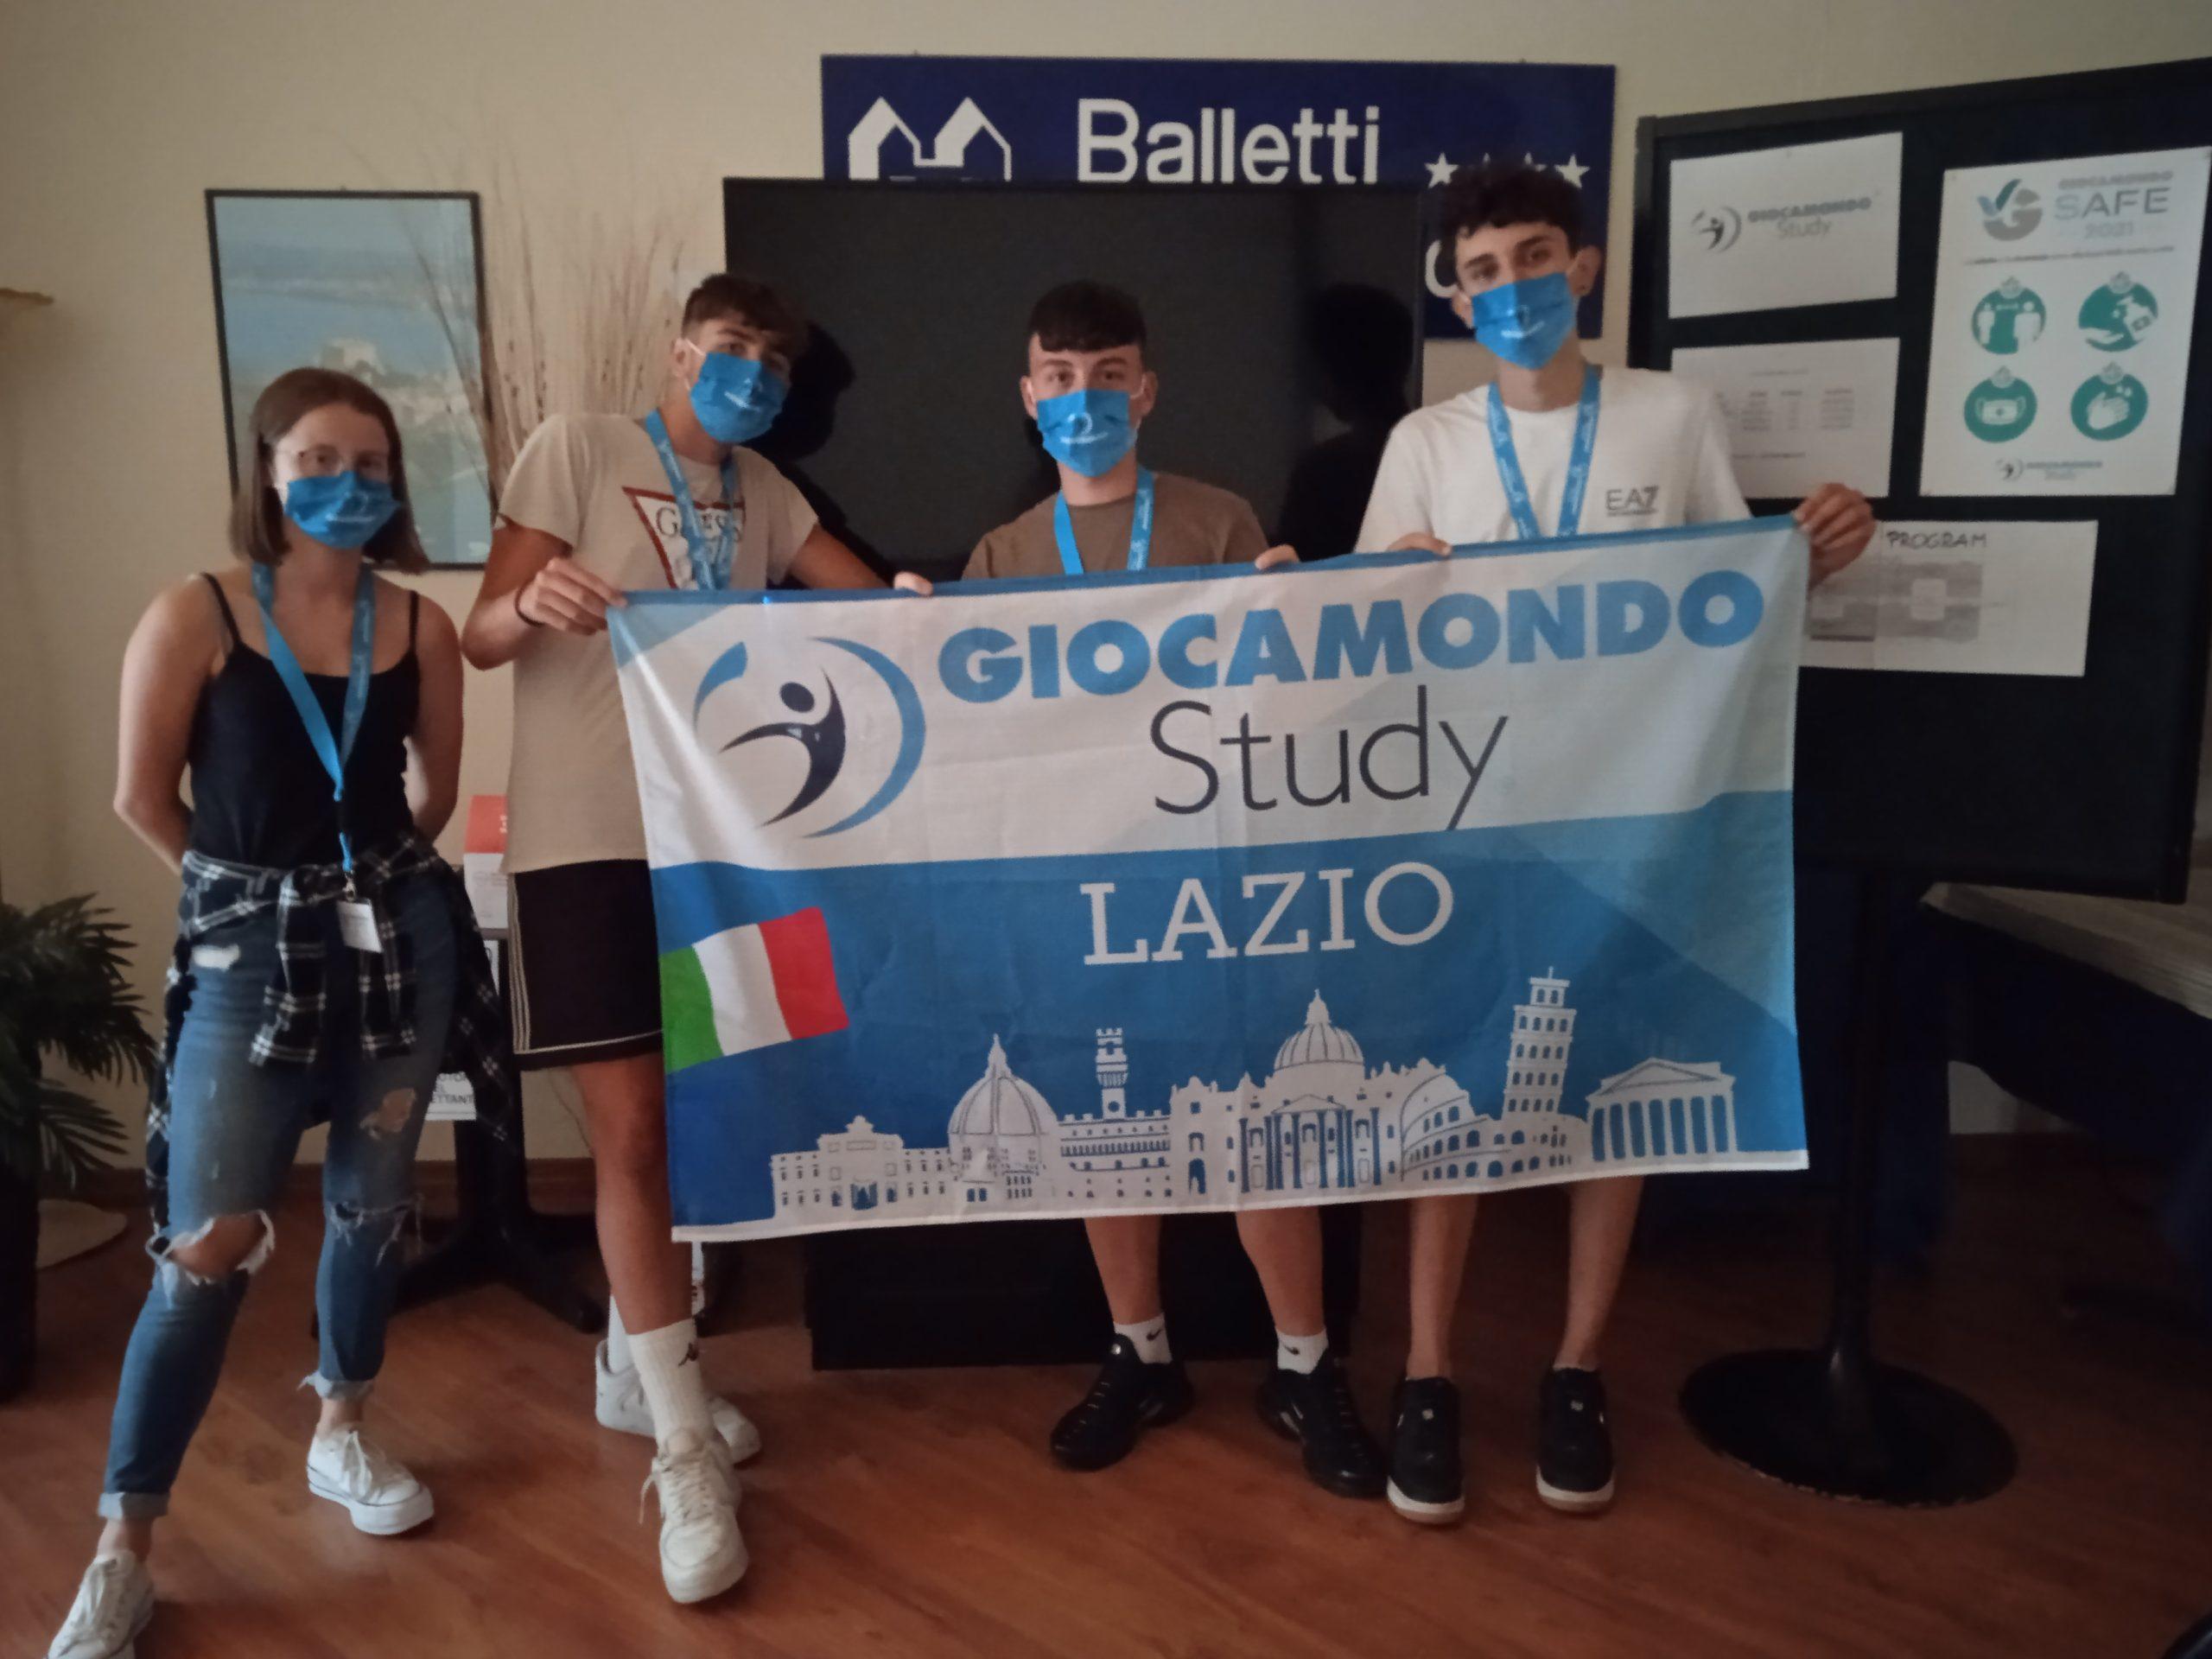 30 giugno 2021 Archivi - Giocamondo Study-IMG_20210629_122643-scaled